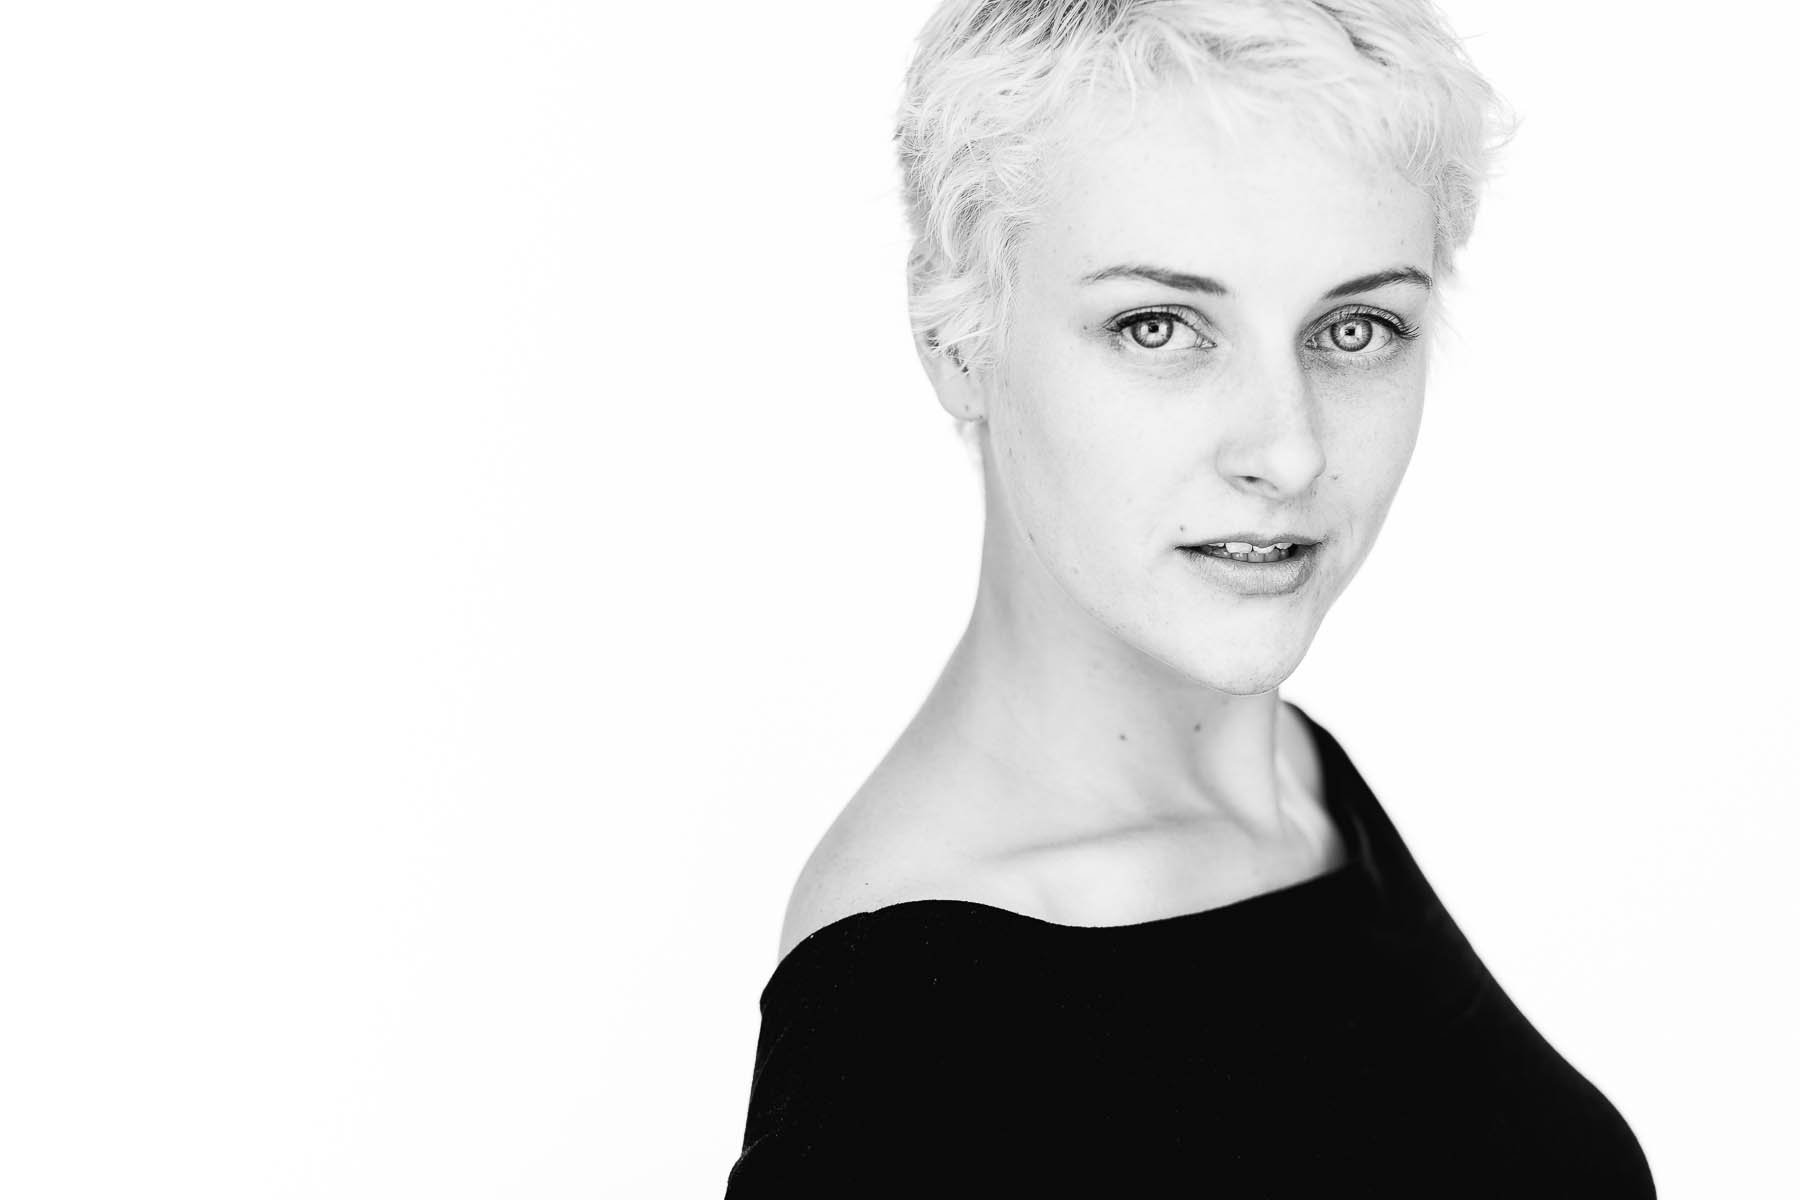 sarah-actor-professional-headshot-session-32.jpg